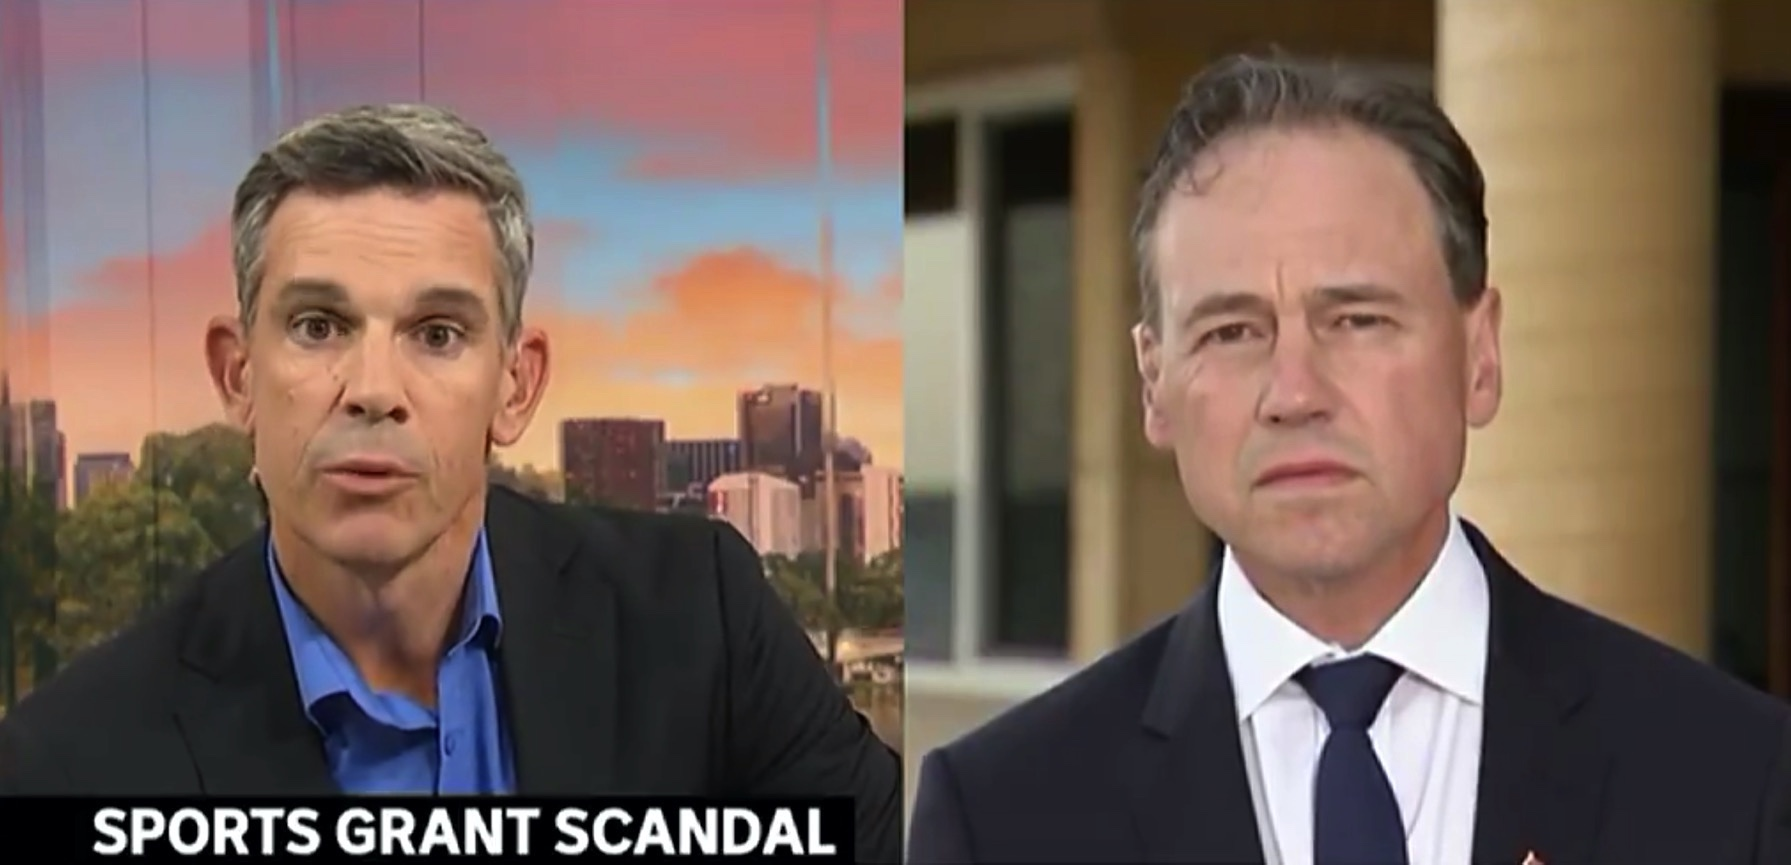 Journalist Paul Kennedy interviews Health Minister Greg Hunt